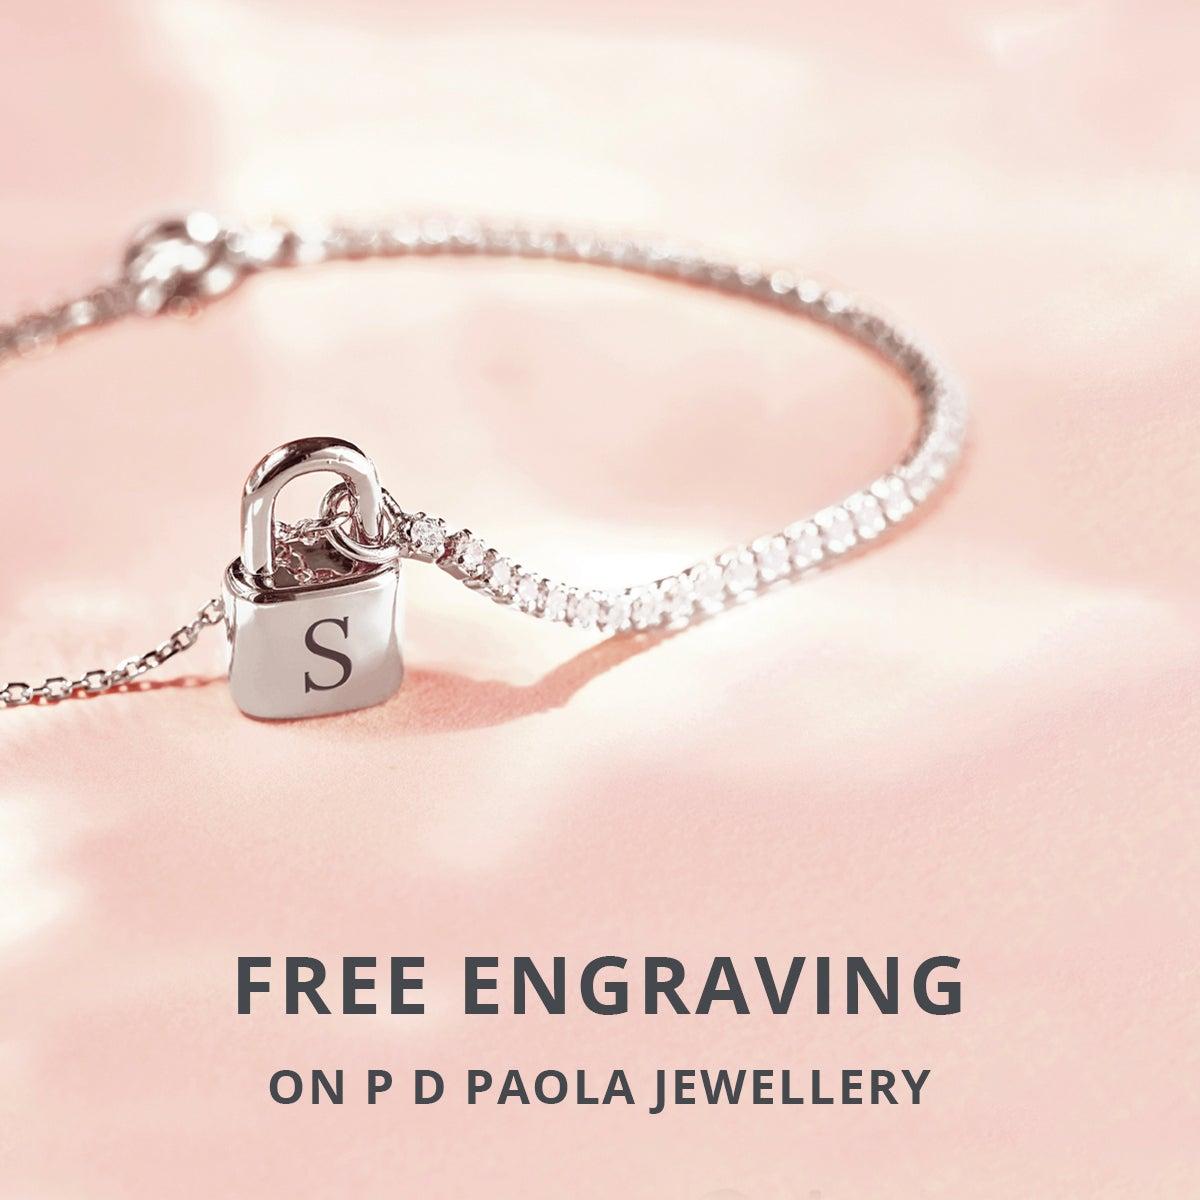 PD PAOLA Free Engraving